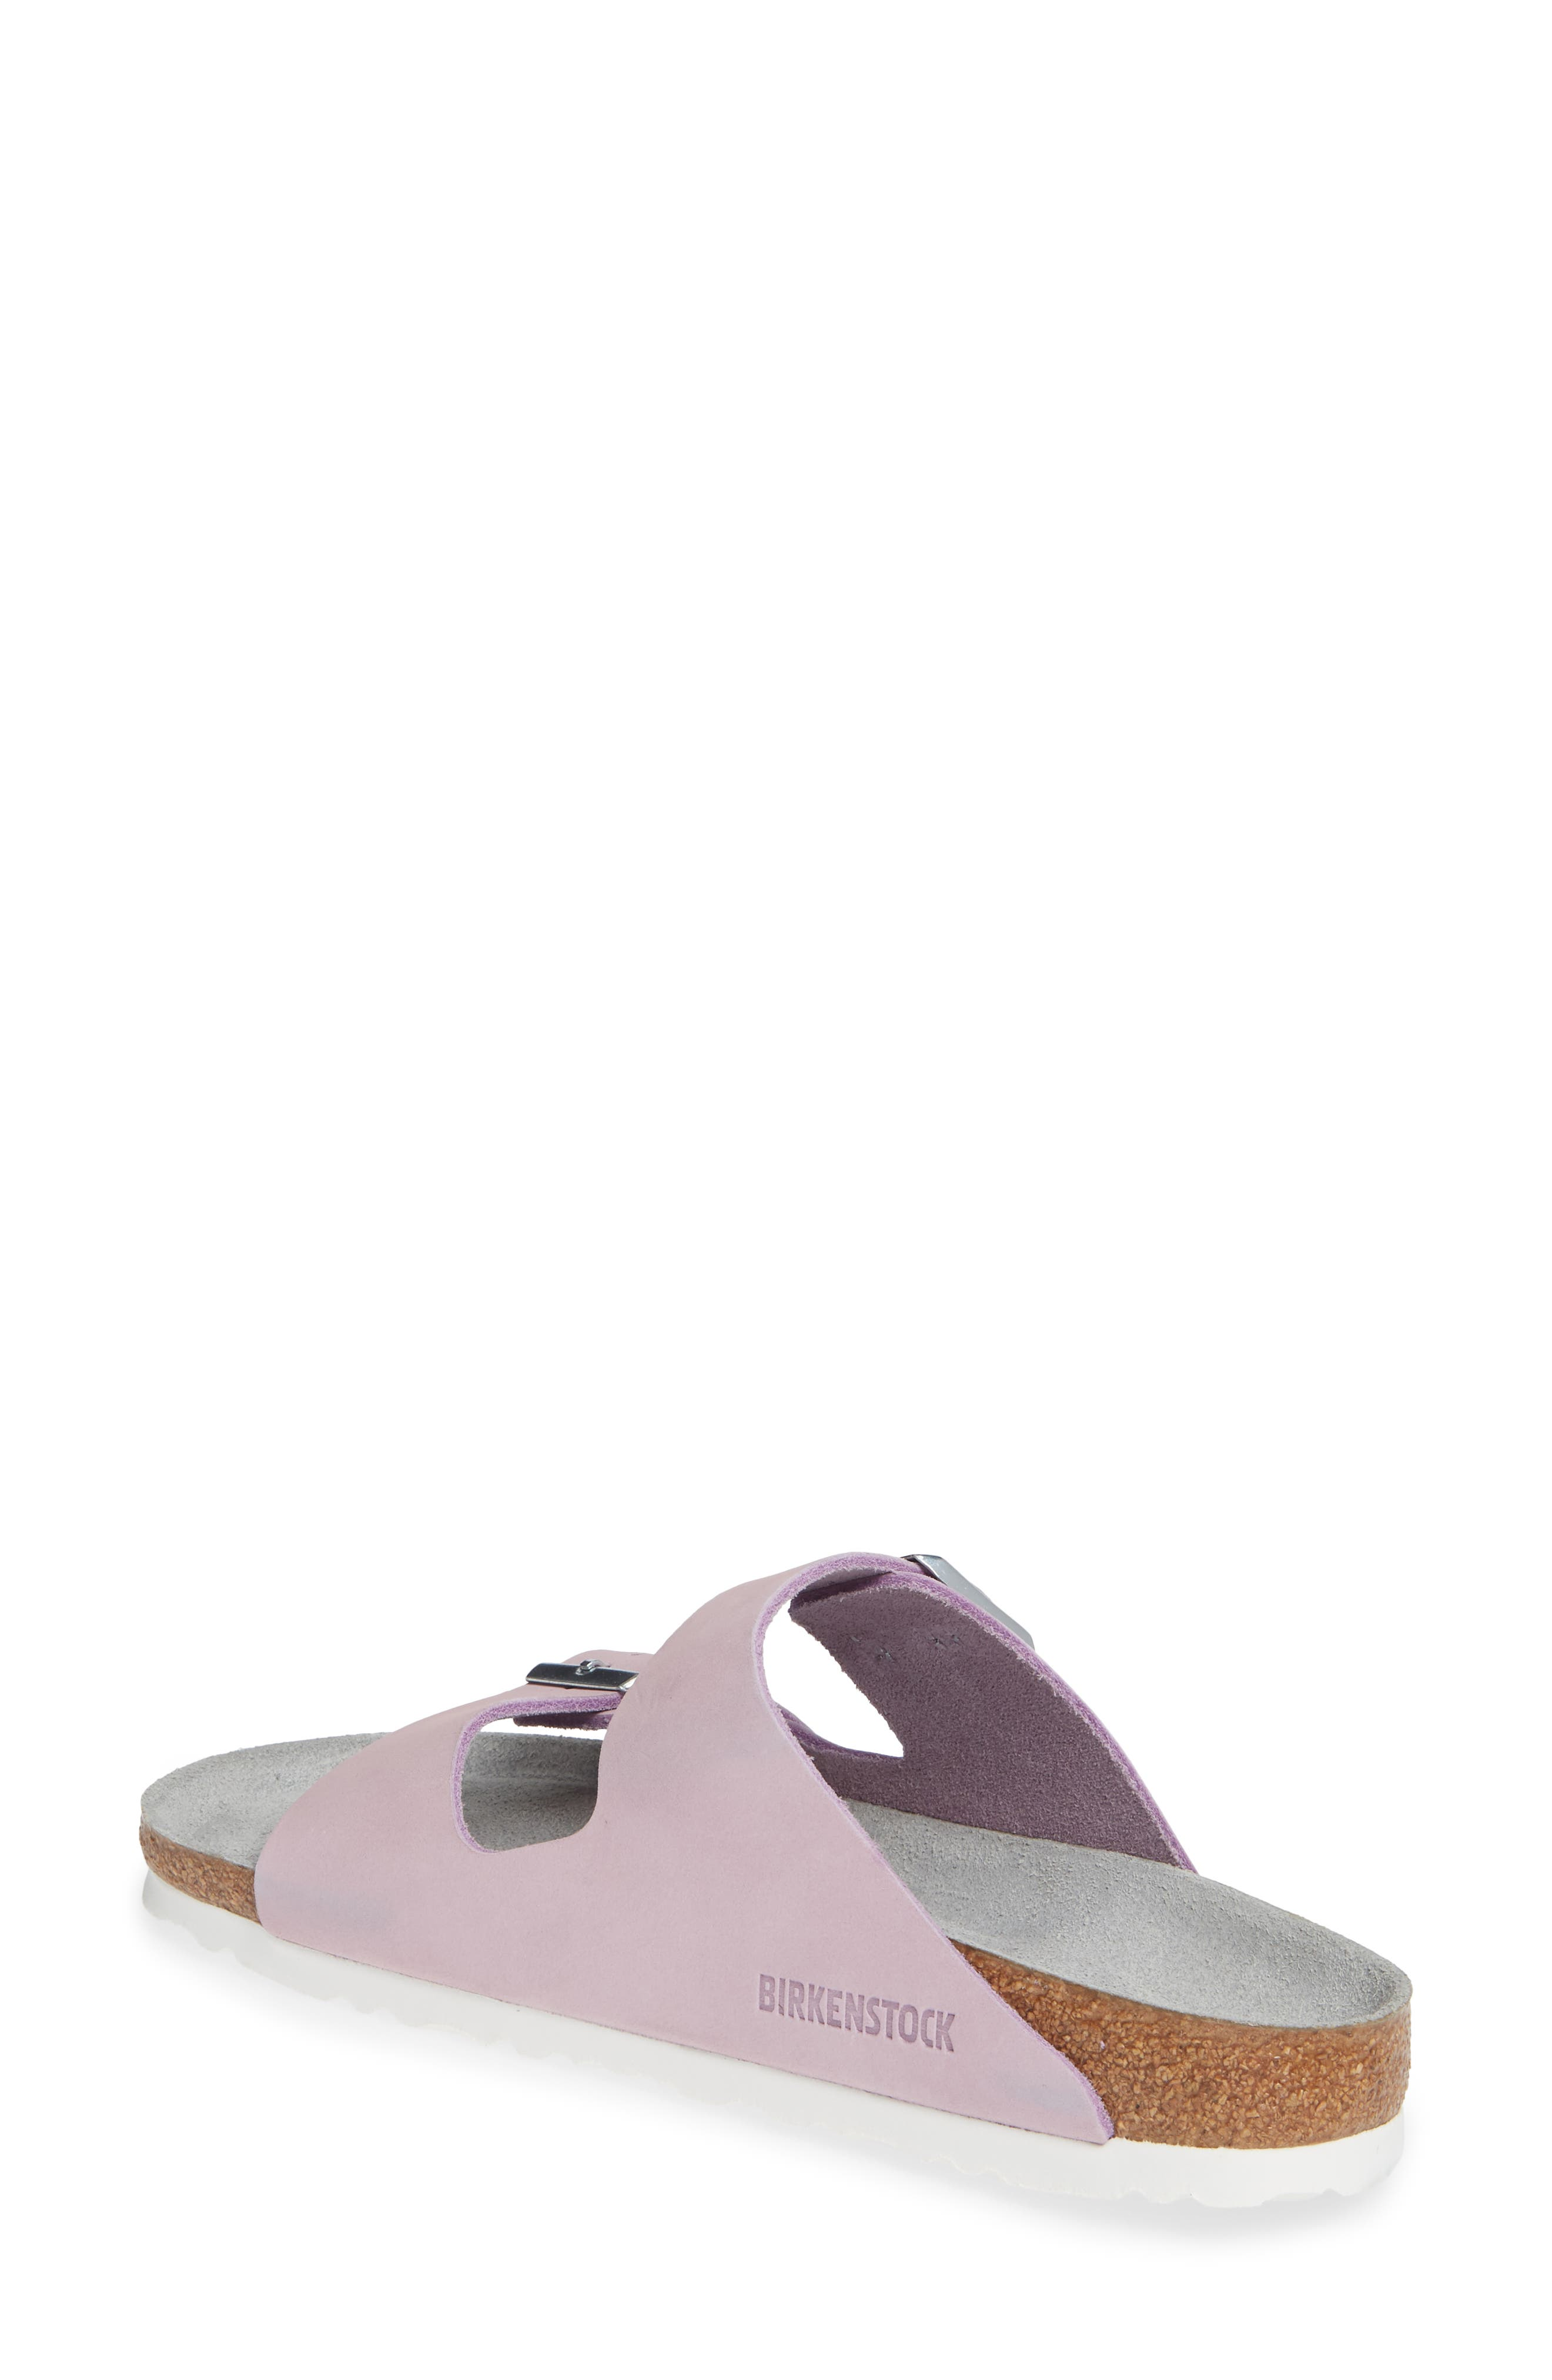 BIRKENSTOCK, Arizona Soft Footbed Sandal, Alternate thumbnail 2, color, LILAC NUBUCK